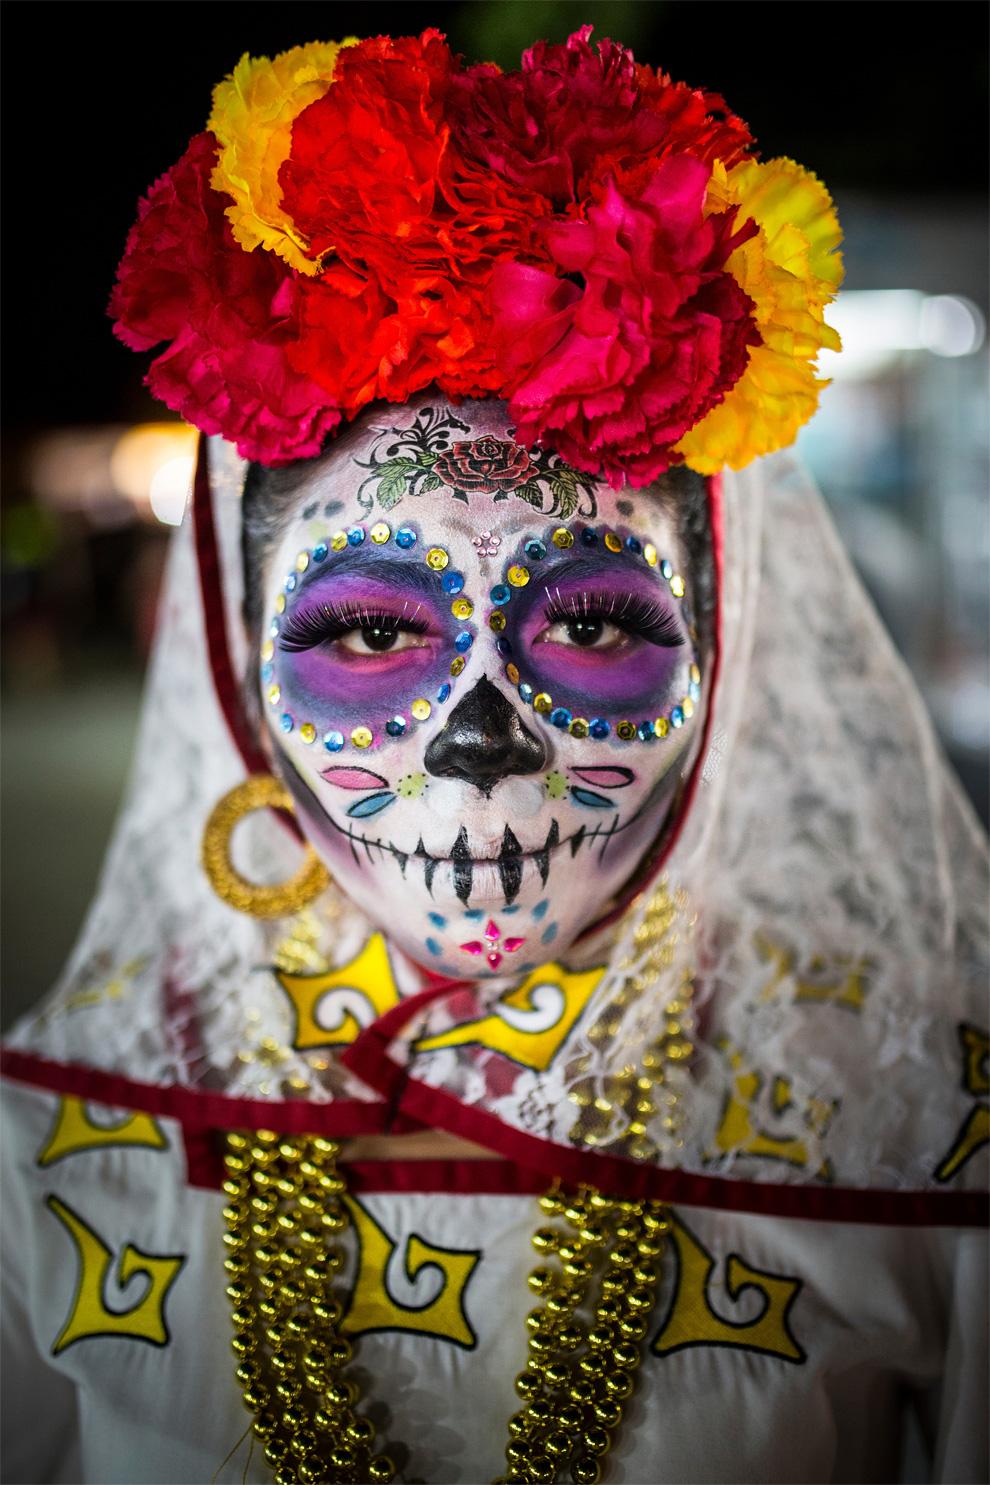 Канкун, Мексика. Категория: Люди.